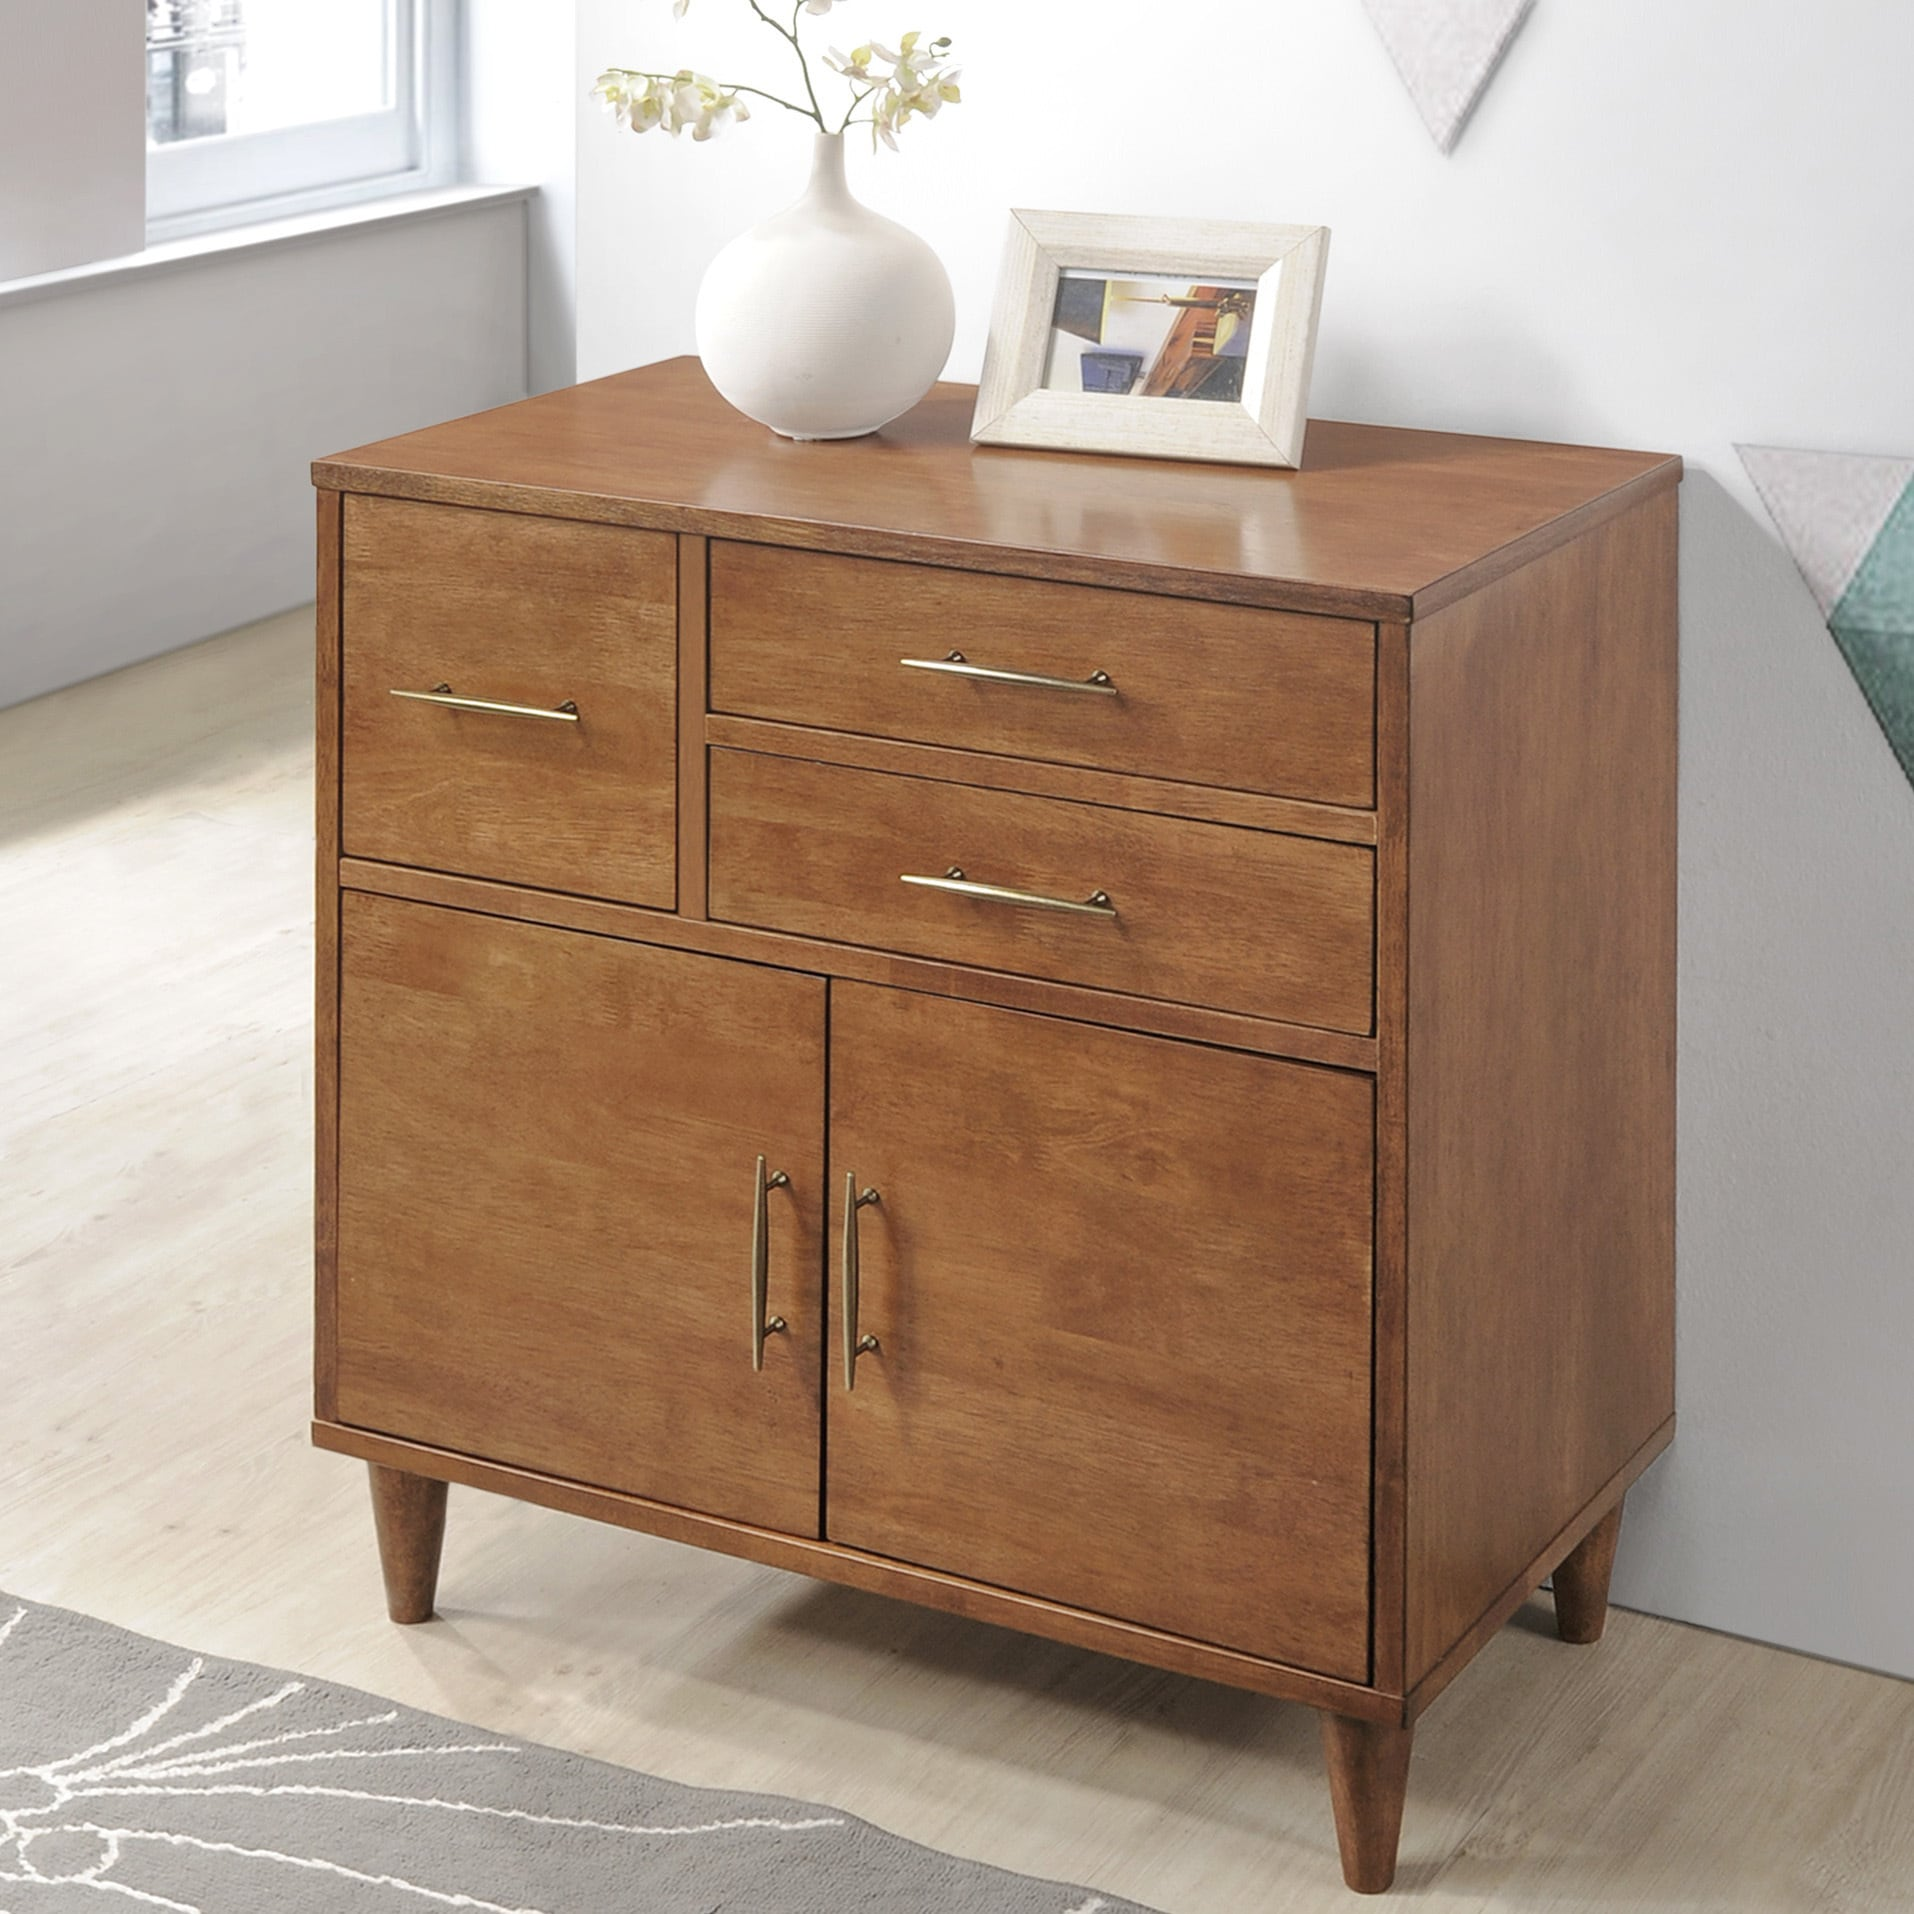 New Jasper Laine Ana Oak Entry Way Cabinet - Free Shipping Today  XD25